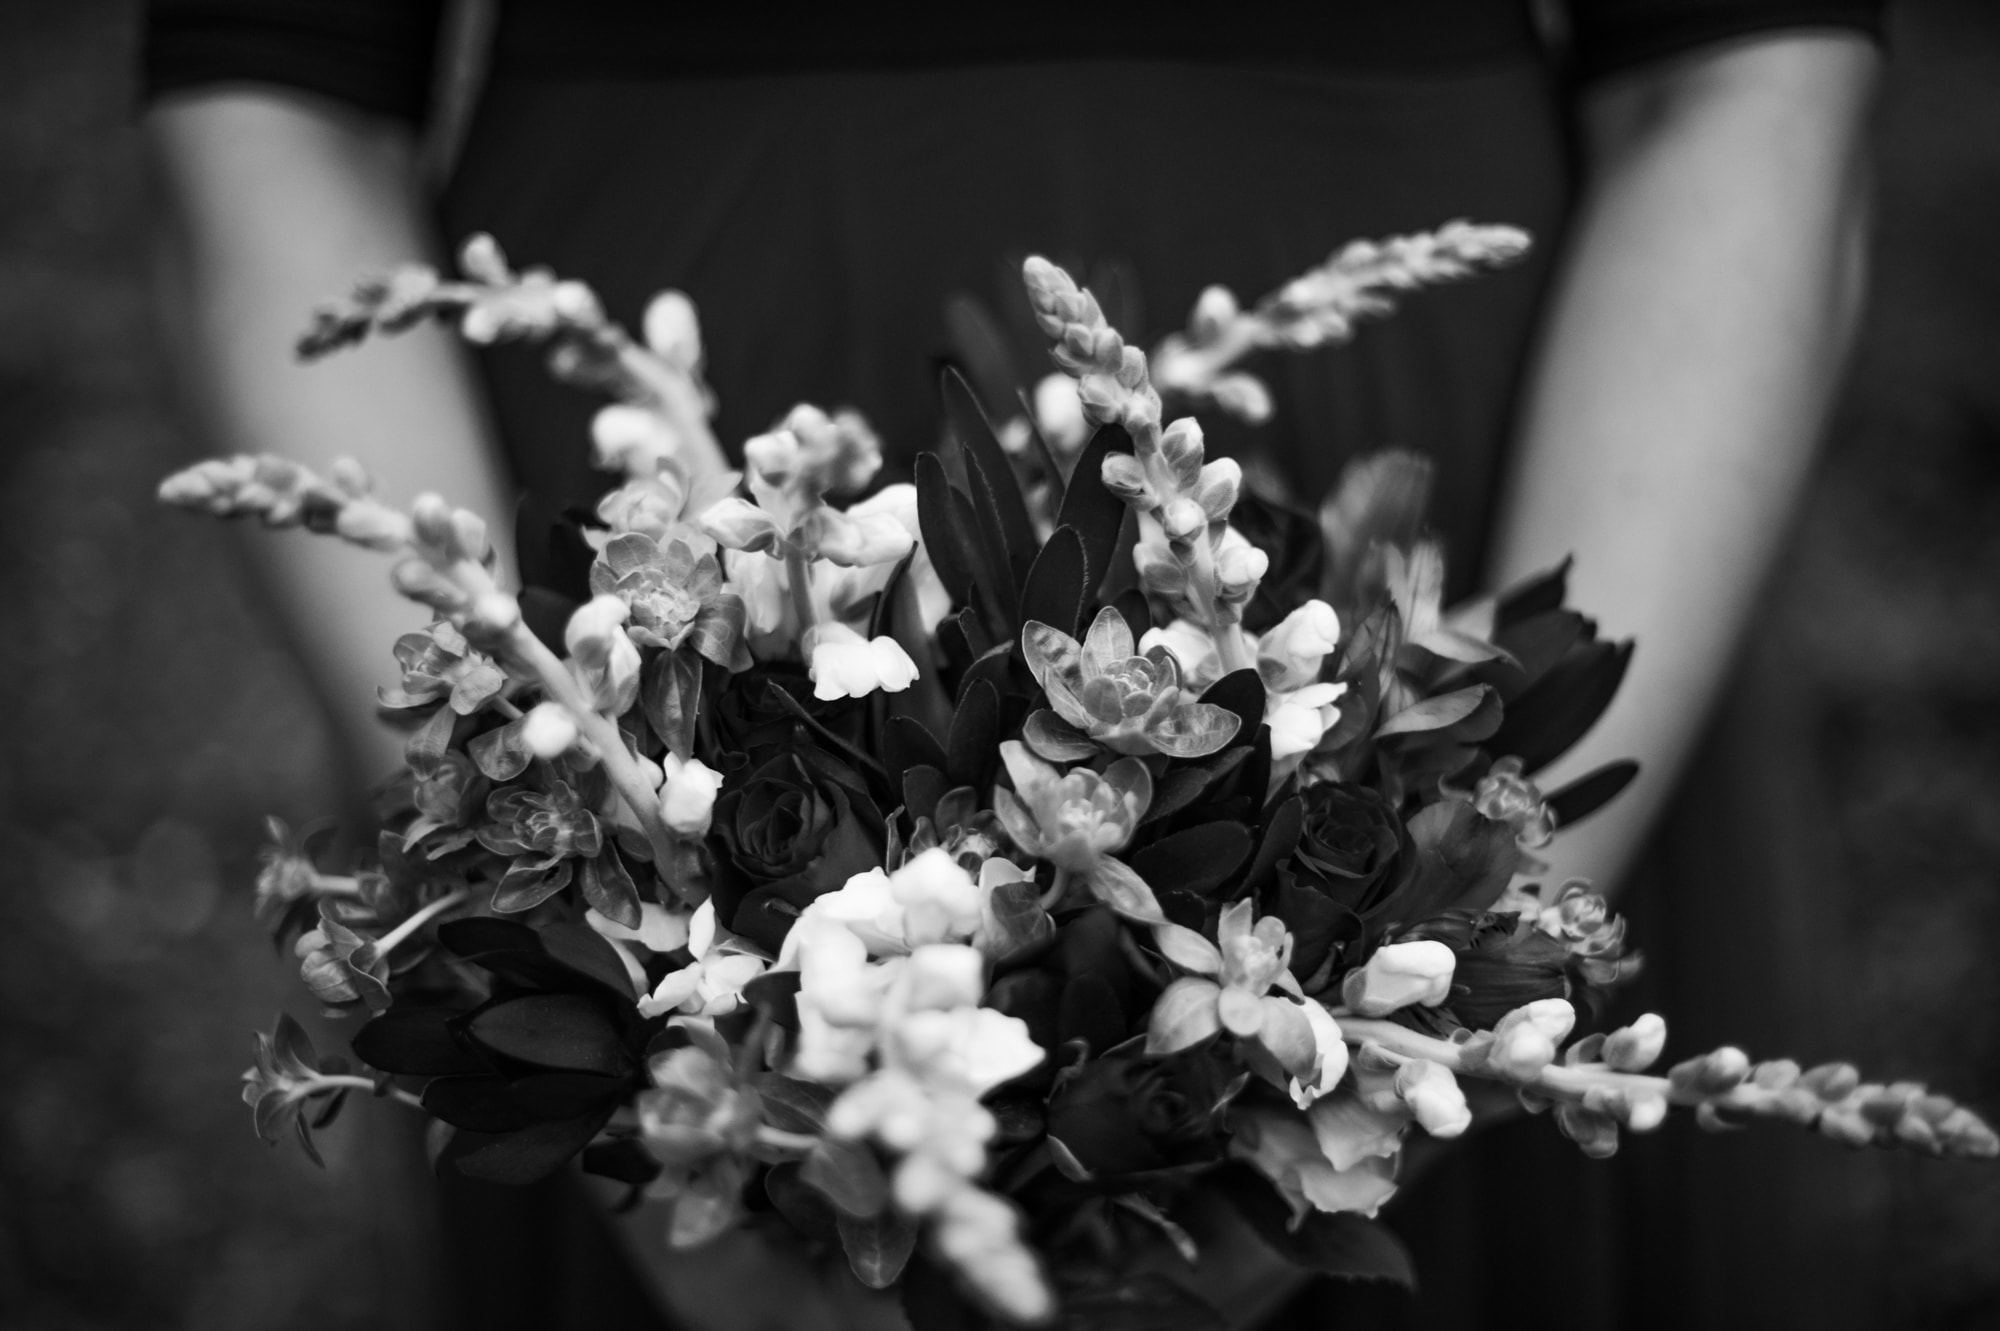 wesley-lanie-george-fernridge-engagement-June-Richards-Photography-Destination-Weddings-Elopements-Garden-Route-33